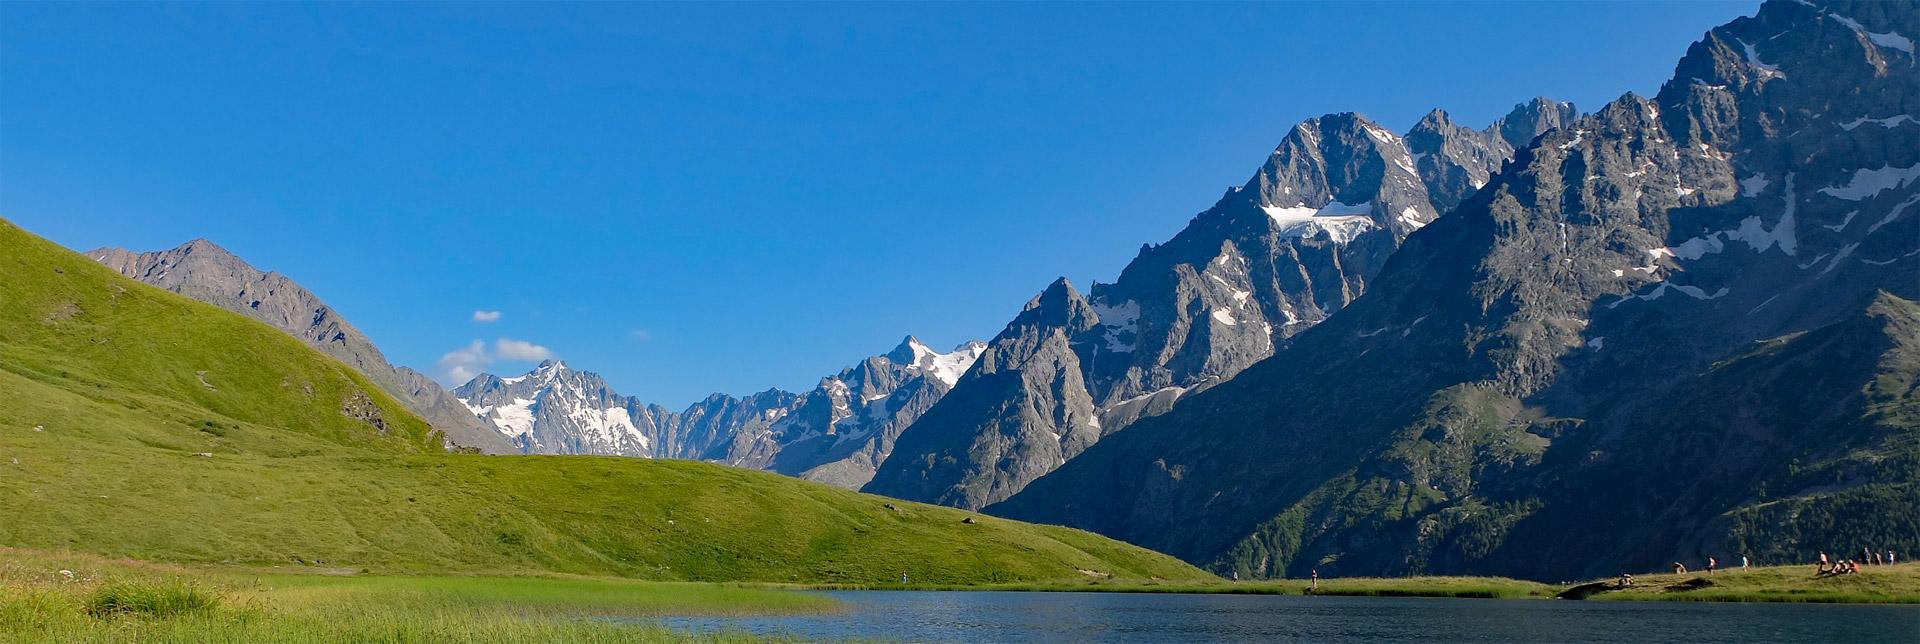 Serre Chevalier - Alpes du Sud